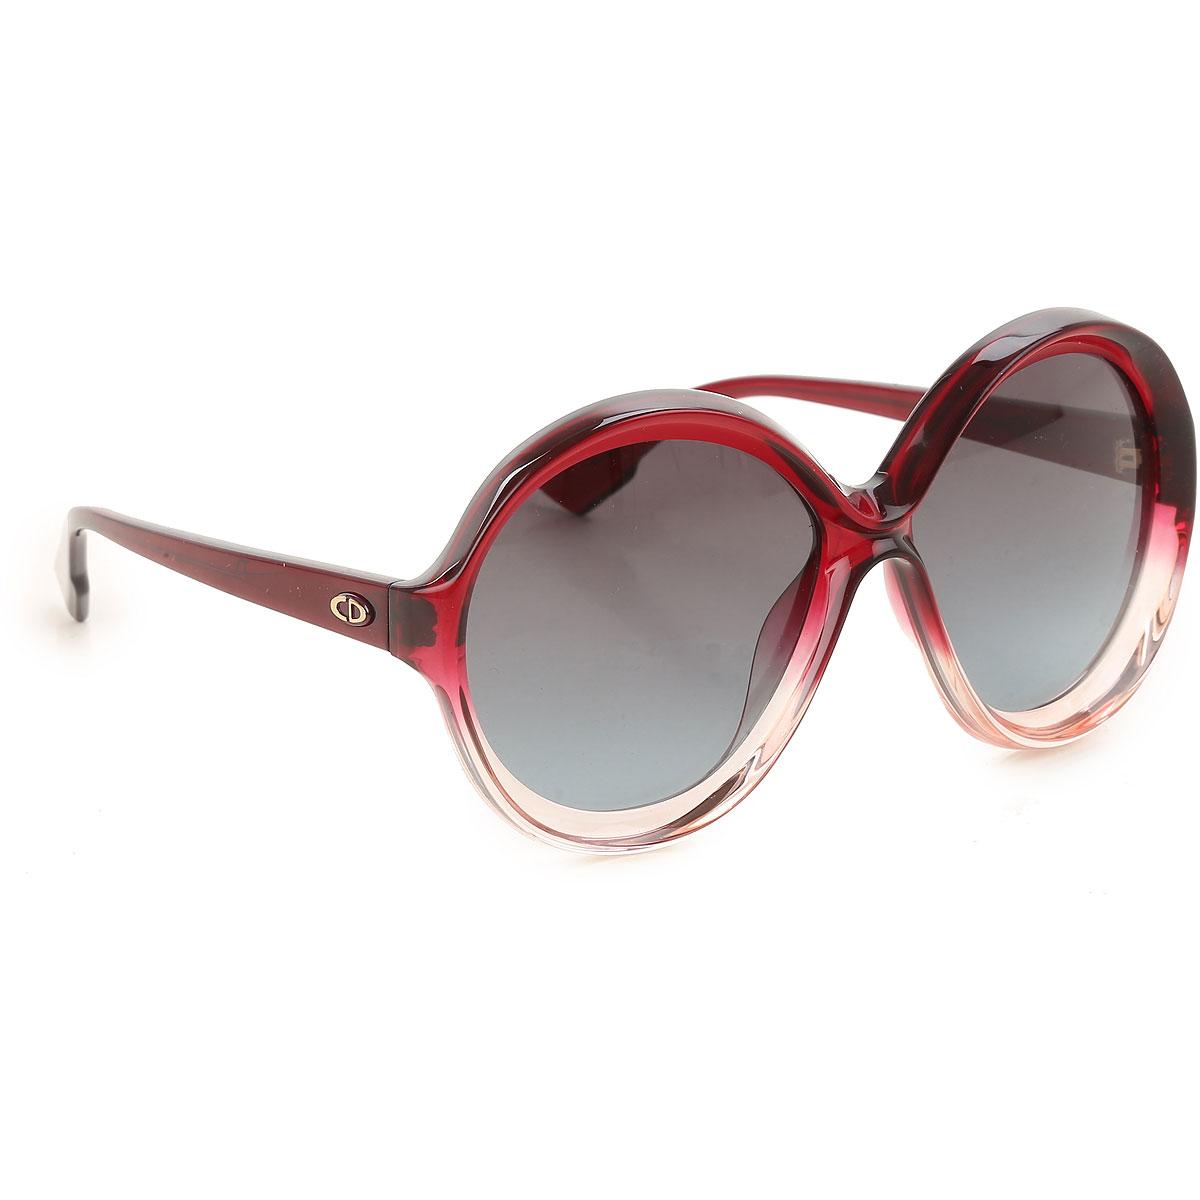 Christian Dior Sunglasses On Sale, Burgundy Shaded, 2019